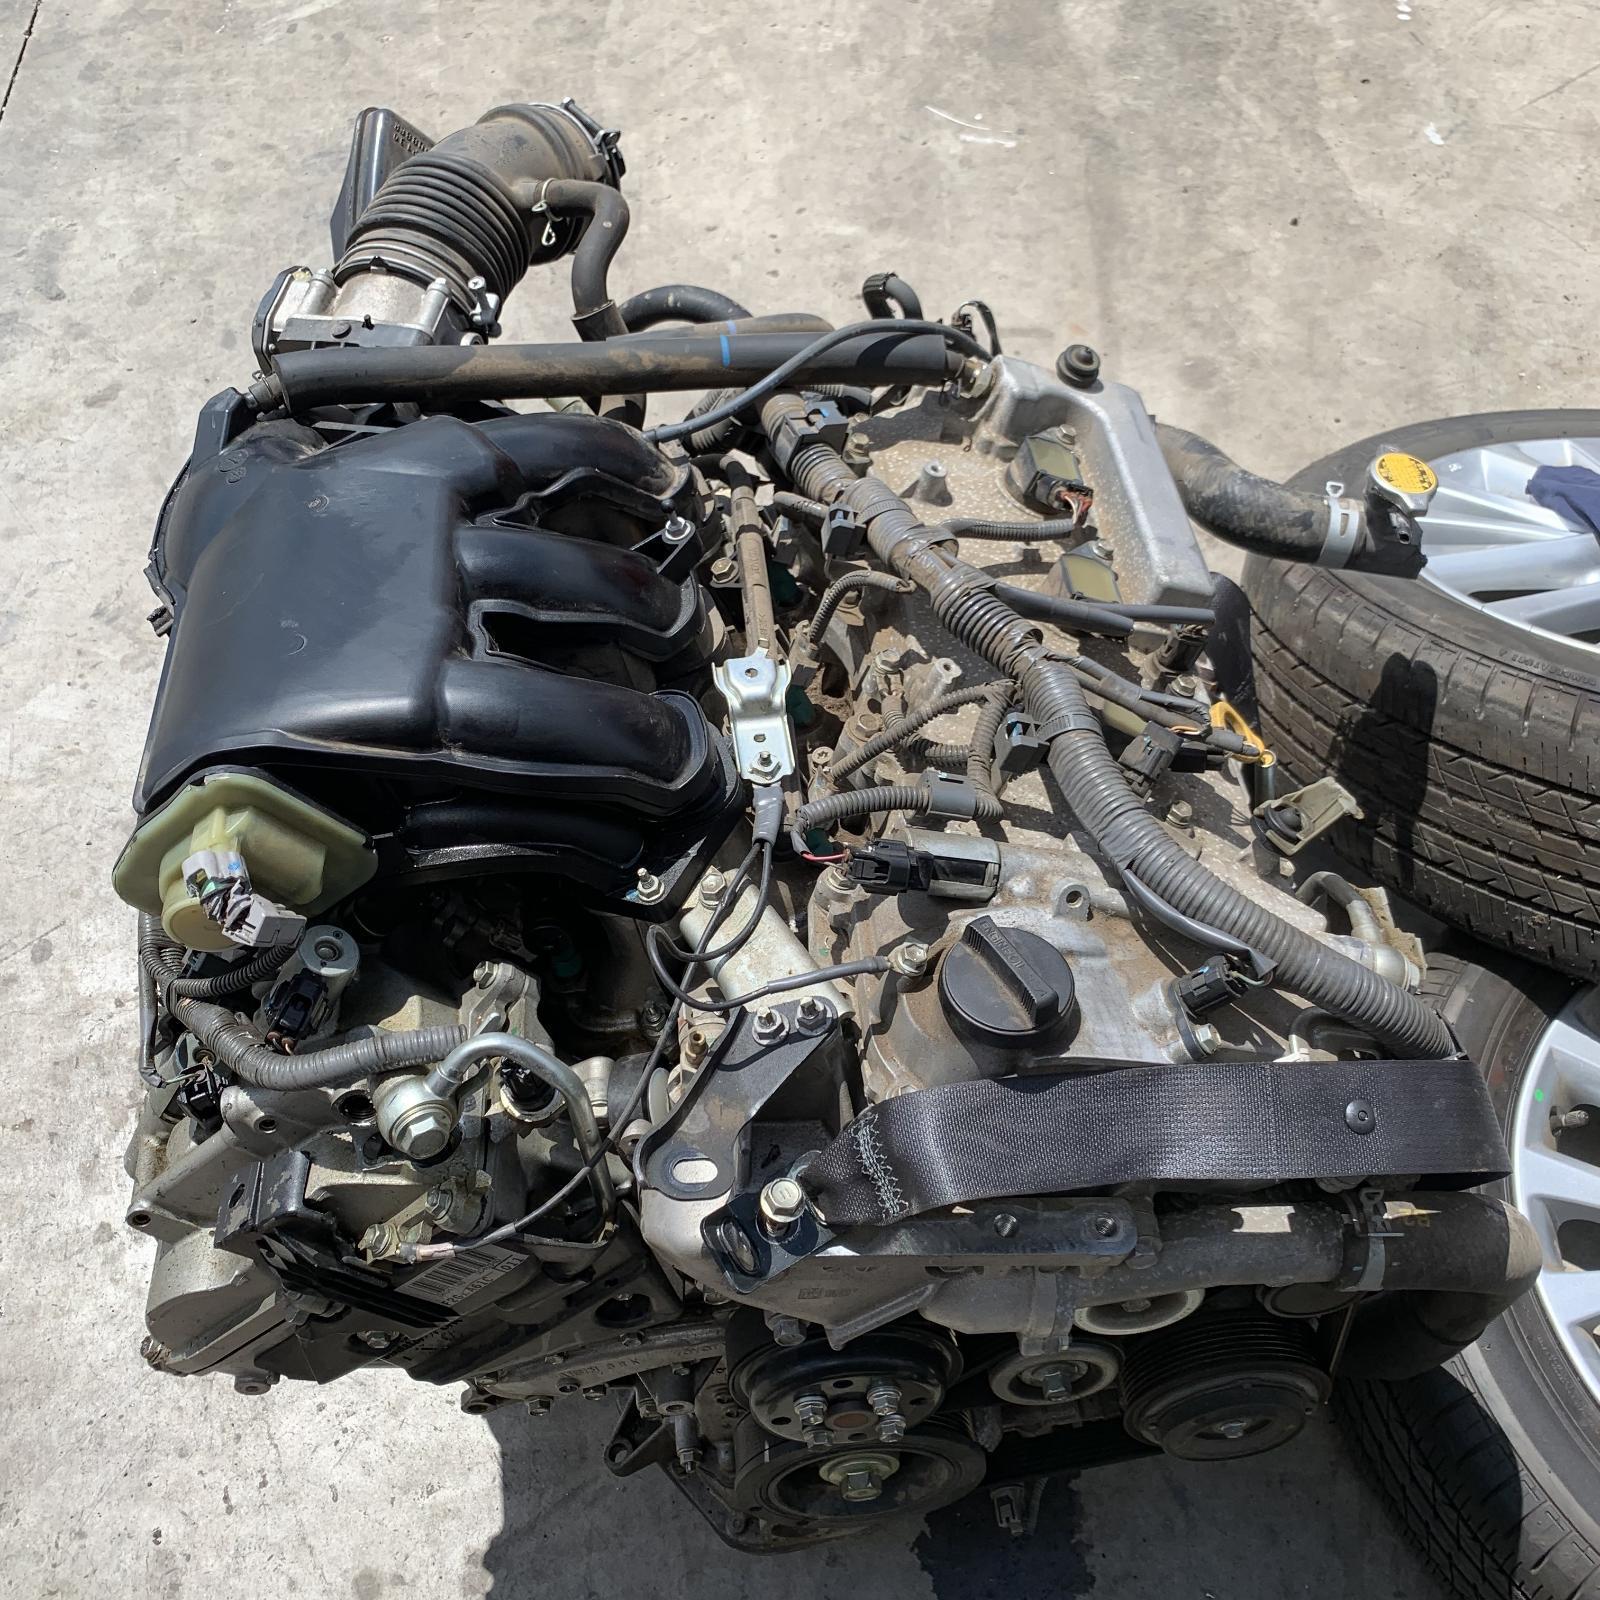 TOYOTA AURION, Engine, 3.5, 2GR-FE, GSV40R-GSV50R, 10/06-08/17